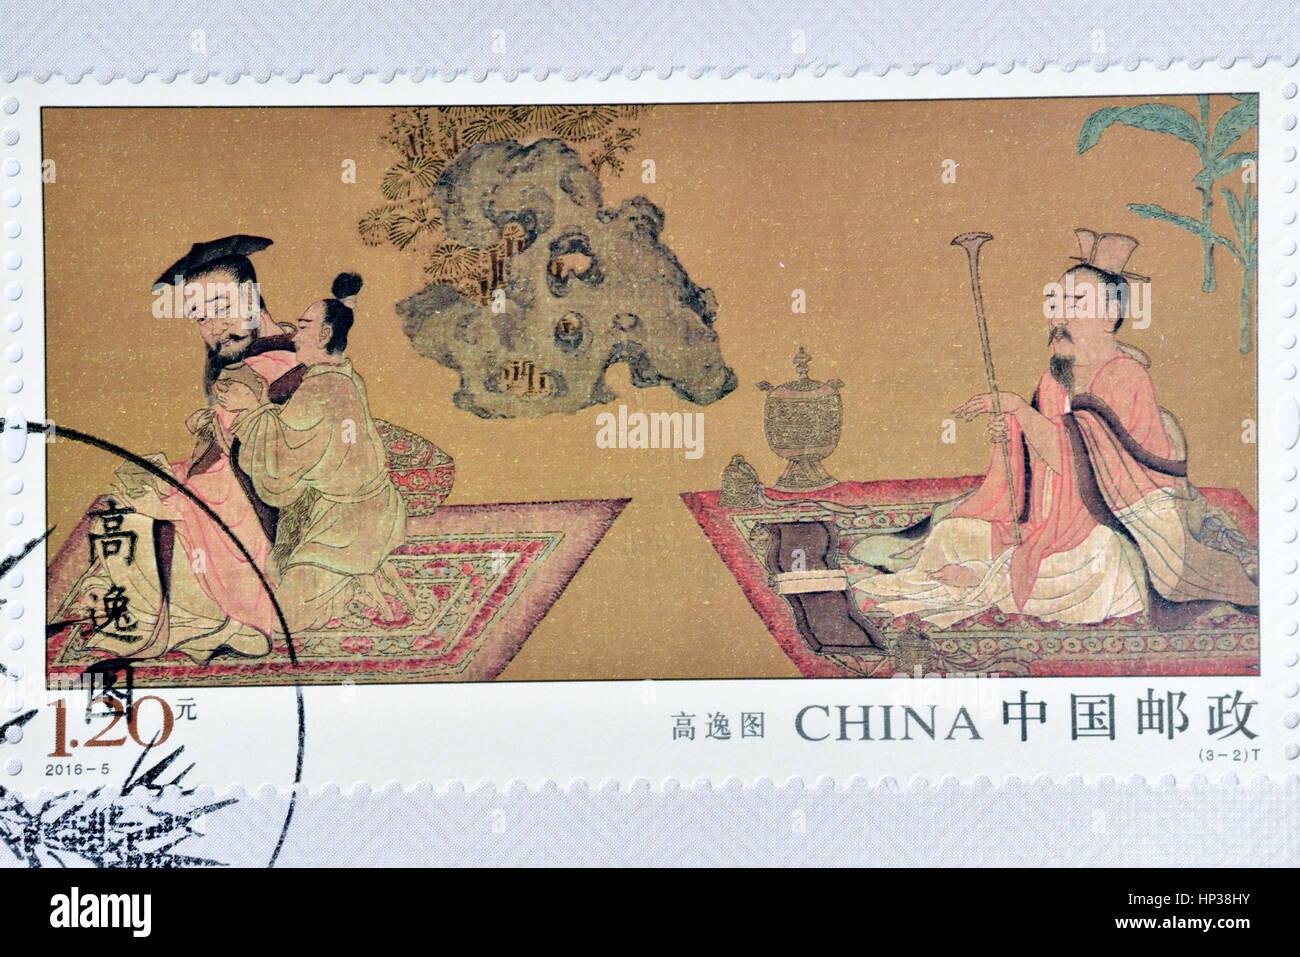 CHINA - CIRCA 2016: A stamp printed in China shows 2016-5 Painting of Gaoyi Tu. circa 2016. Stock Photo